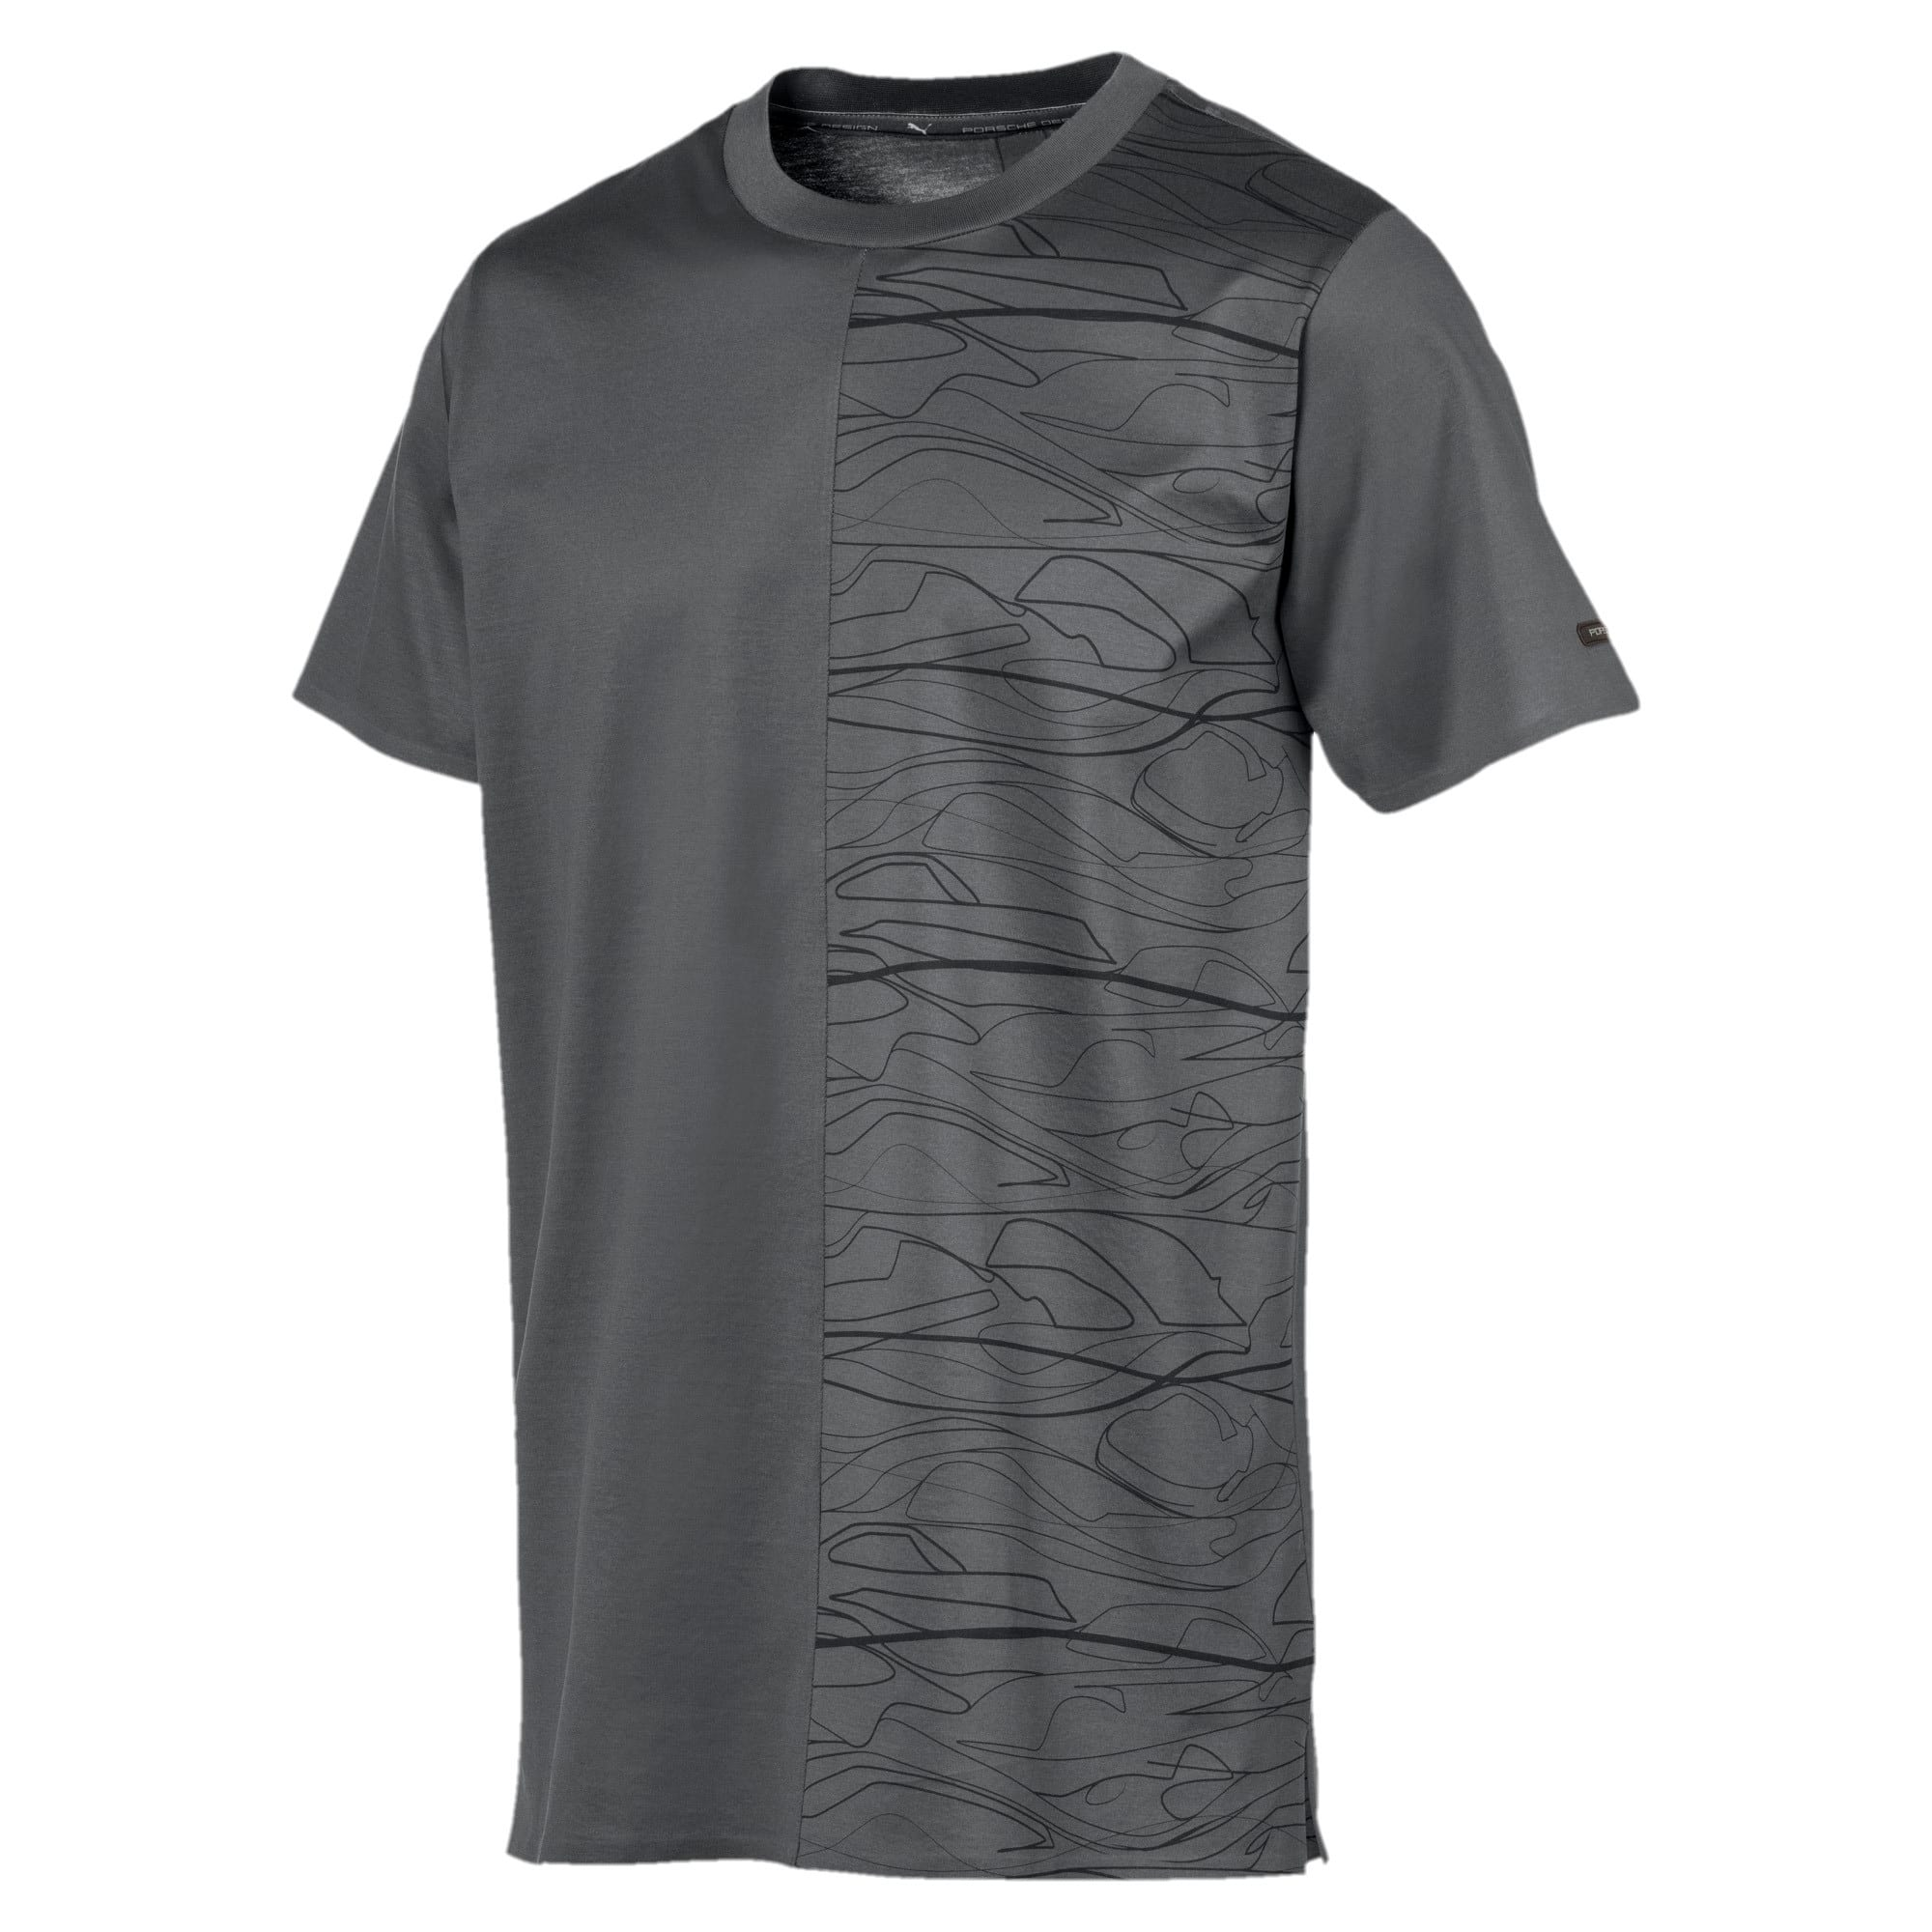 Thumbnail 1 of PORSCHE DESIGN  グラフィック Tシャツ, Asphalt, medium-JPN